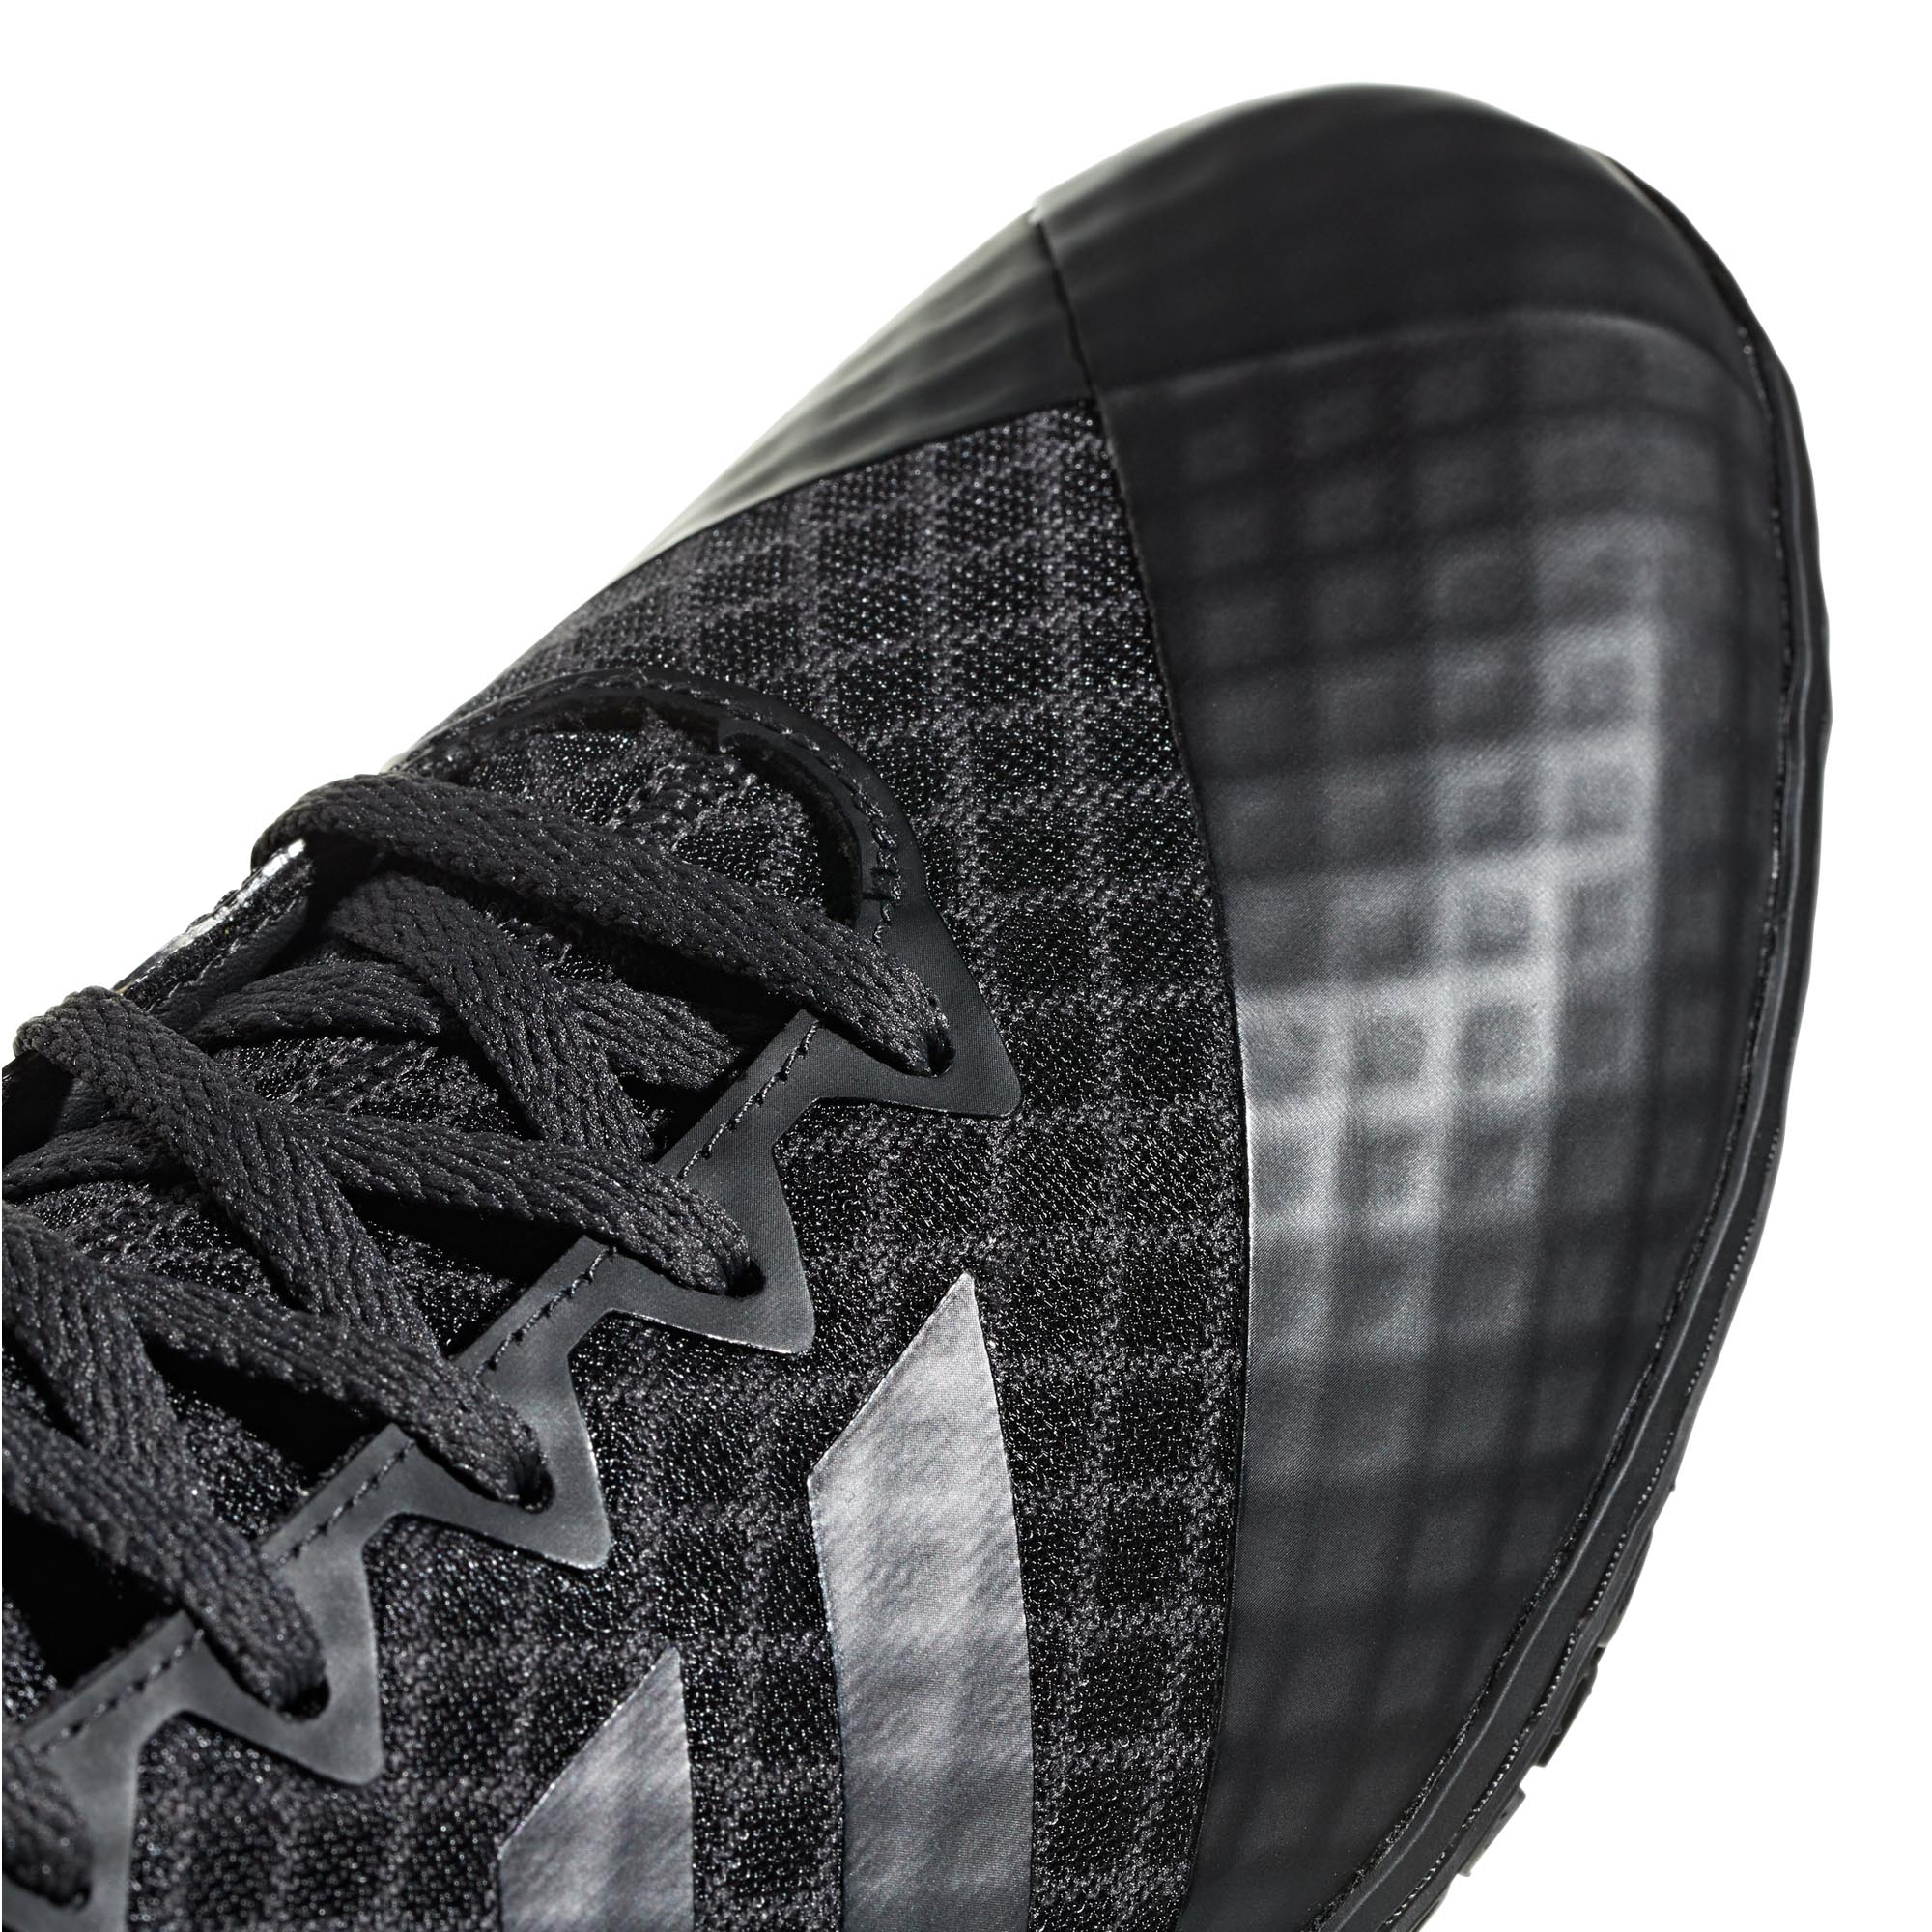 miniature 9 - Adidas Mat Wizard 4 homme adulte lutte Trainer Shoe Boot Noir